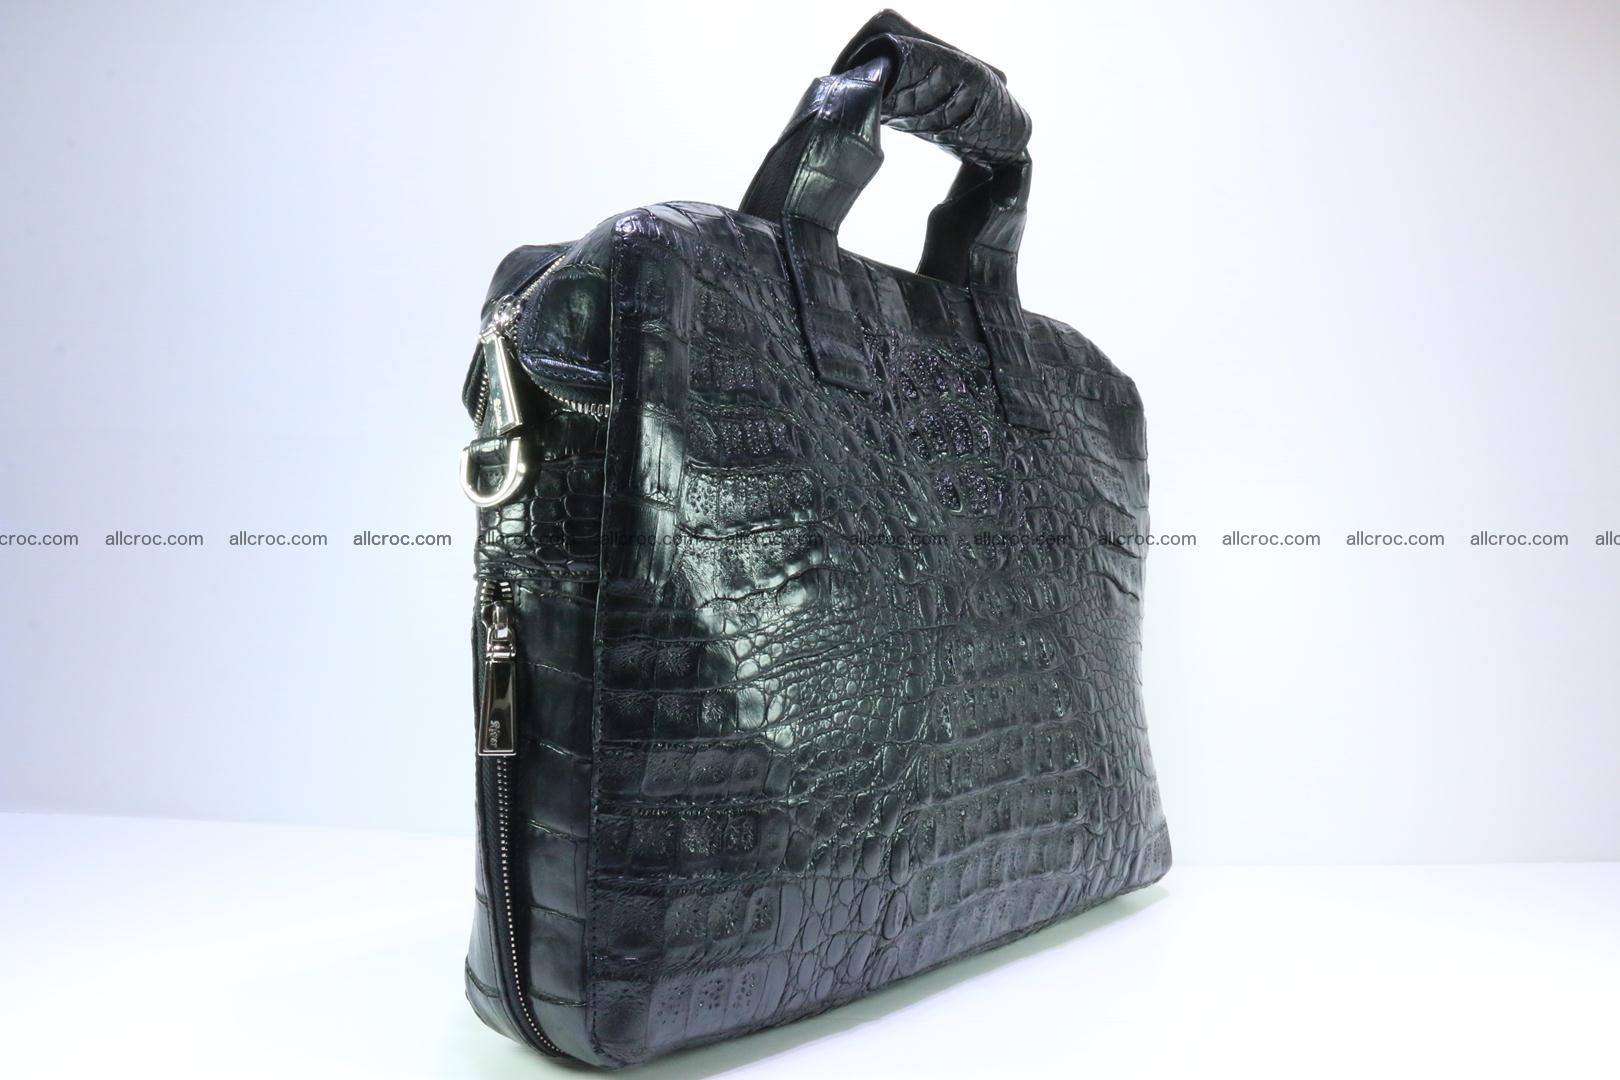 Crocodile skin handbag 127 Foto 2